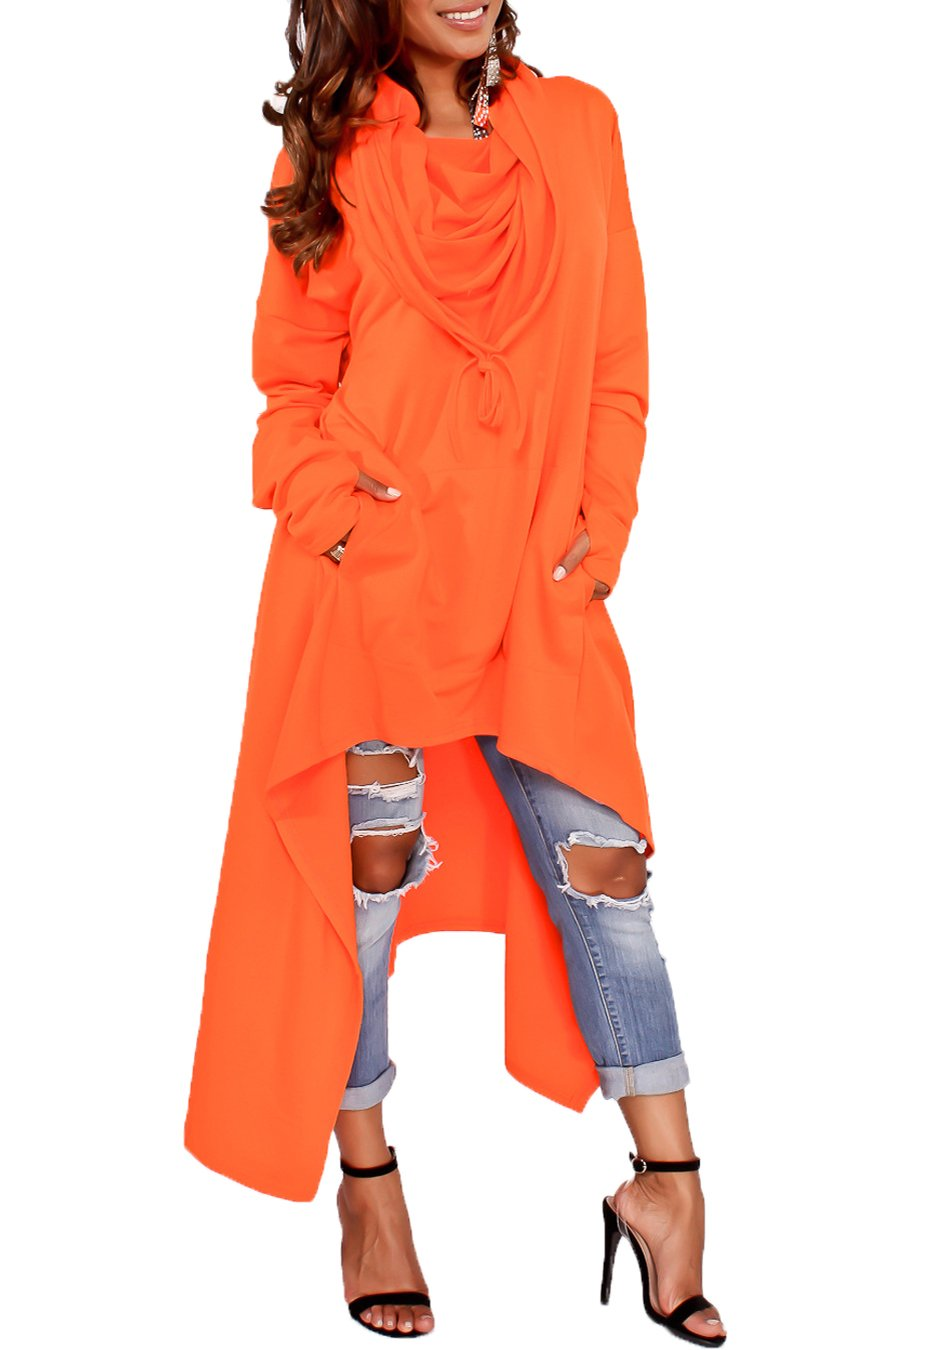 Playworld Womens Irregular Hem Loose Long Sleeve Hooded Tunic Top Dress Orange-M